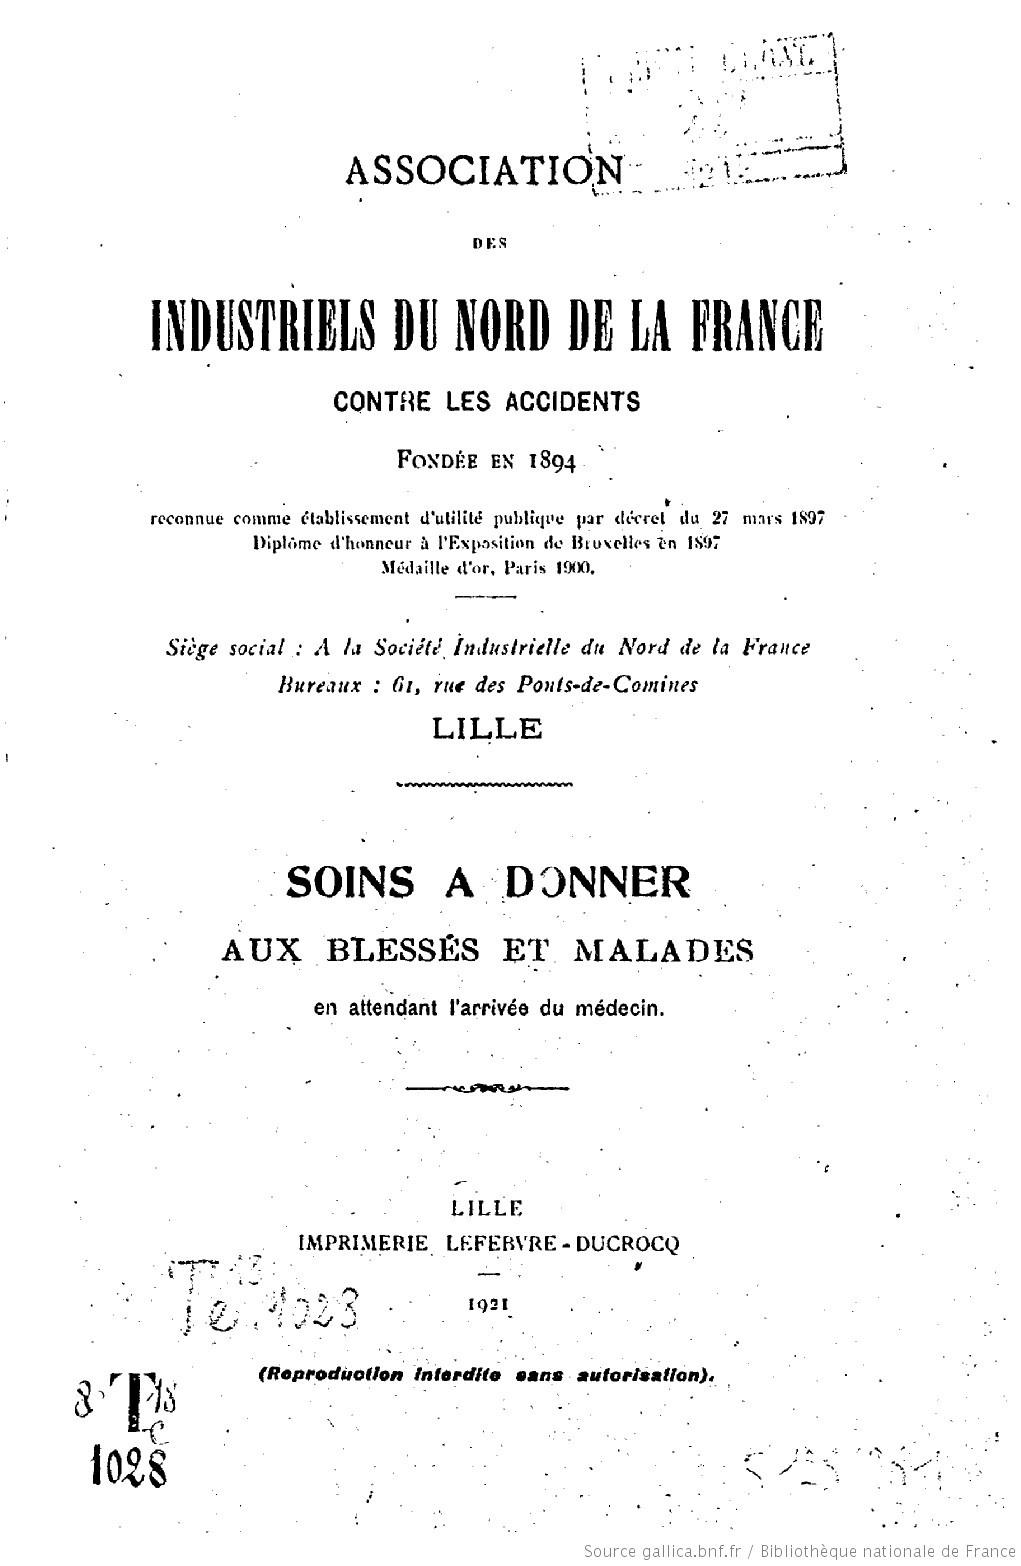 http://gallica.bnf.fr/ark:/12148/bpt6k5603476w.thumbnail.highres.jpg